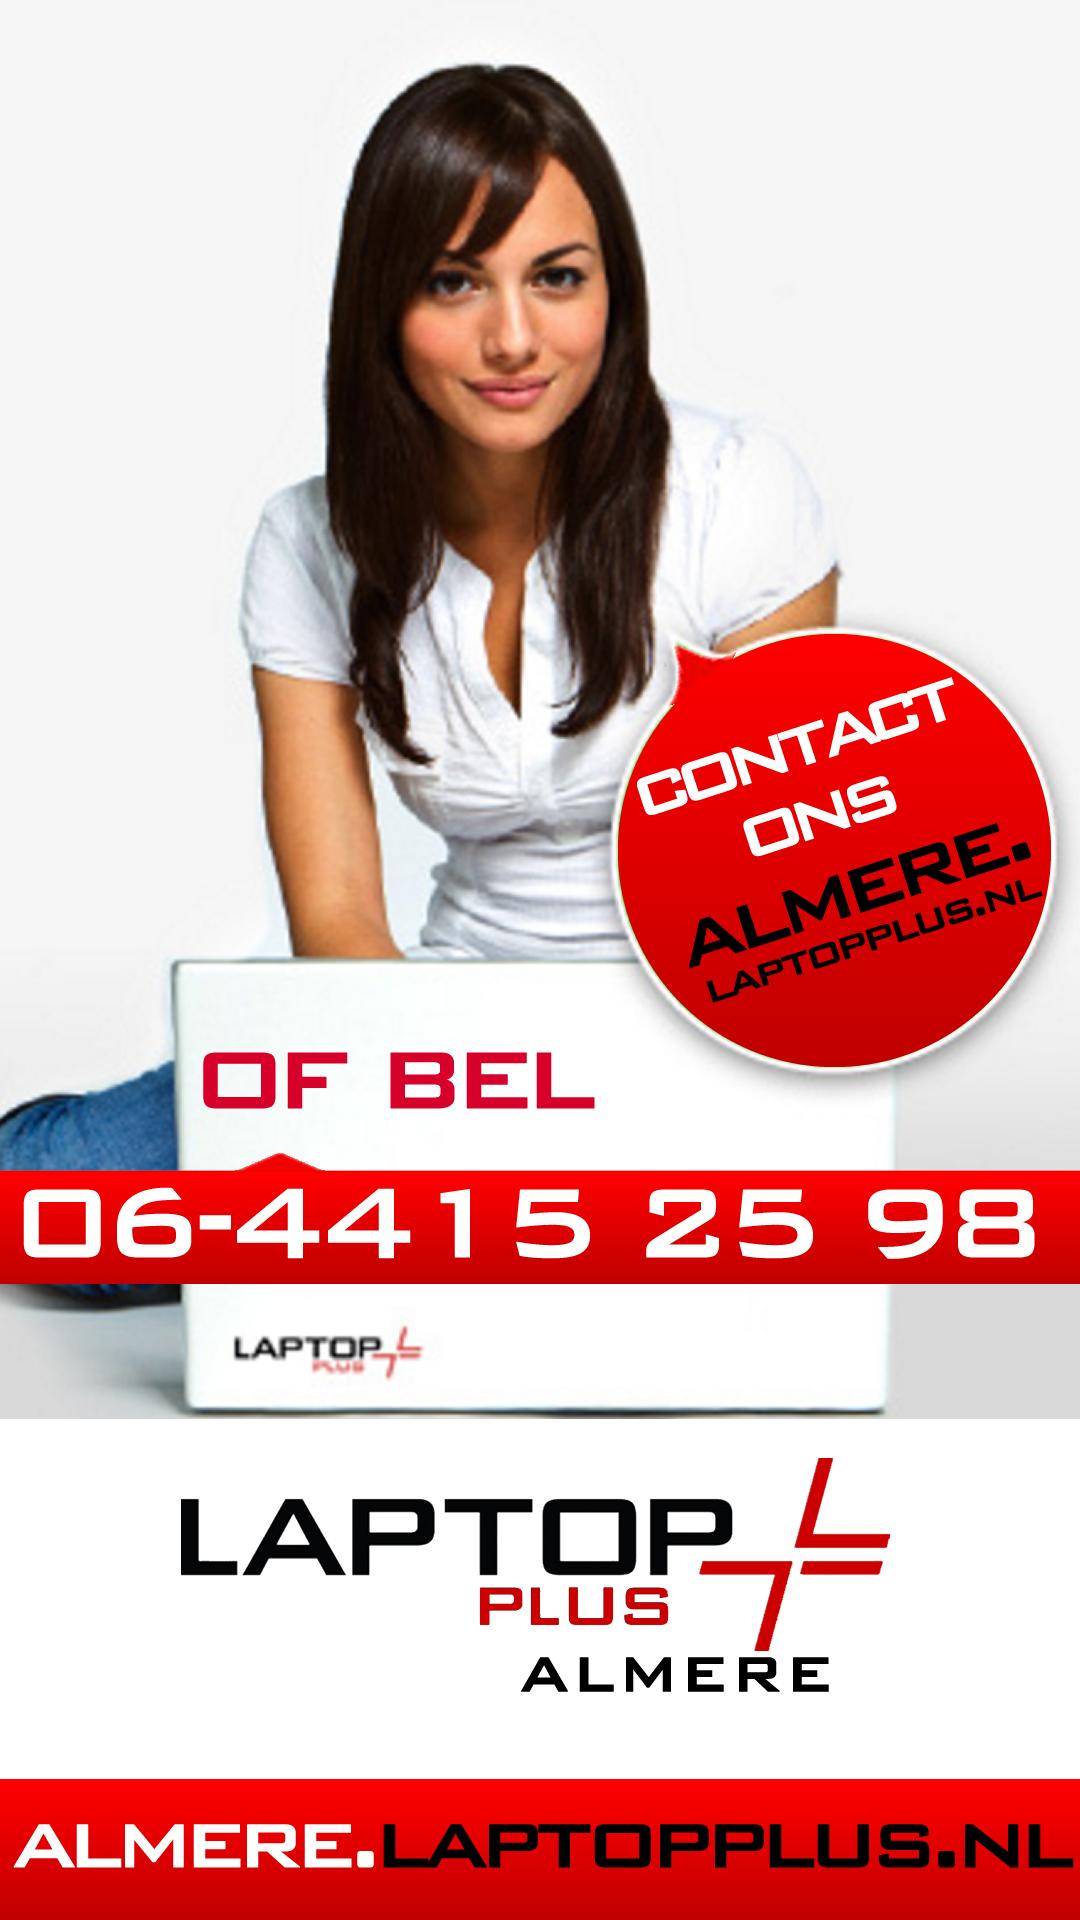 Laptopplus_almere_1